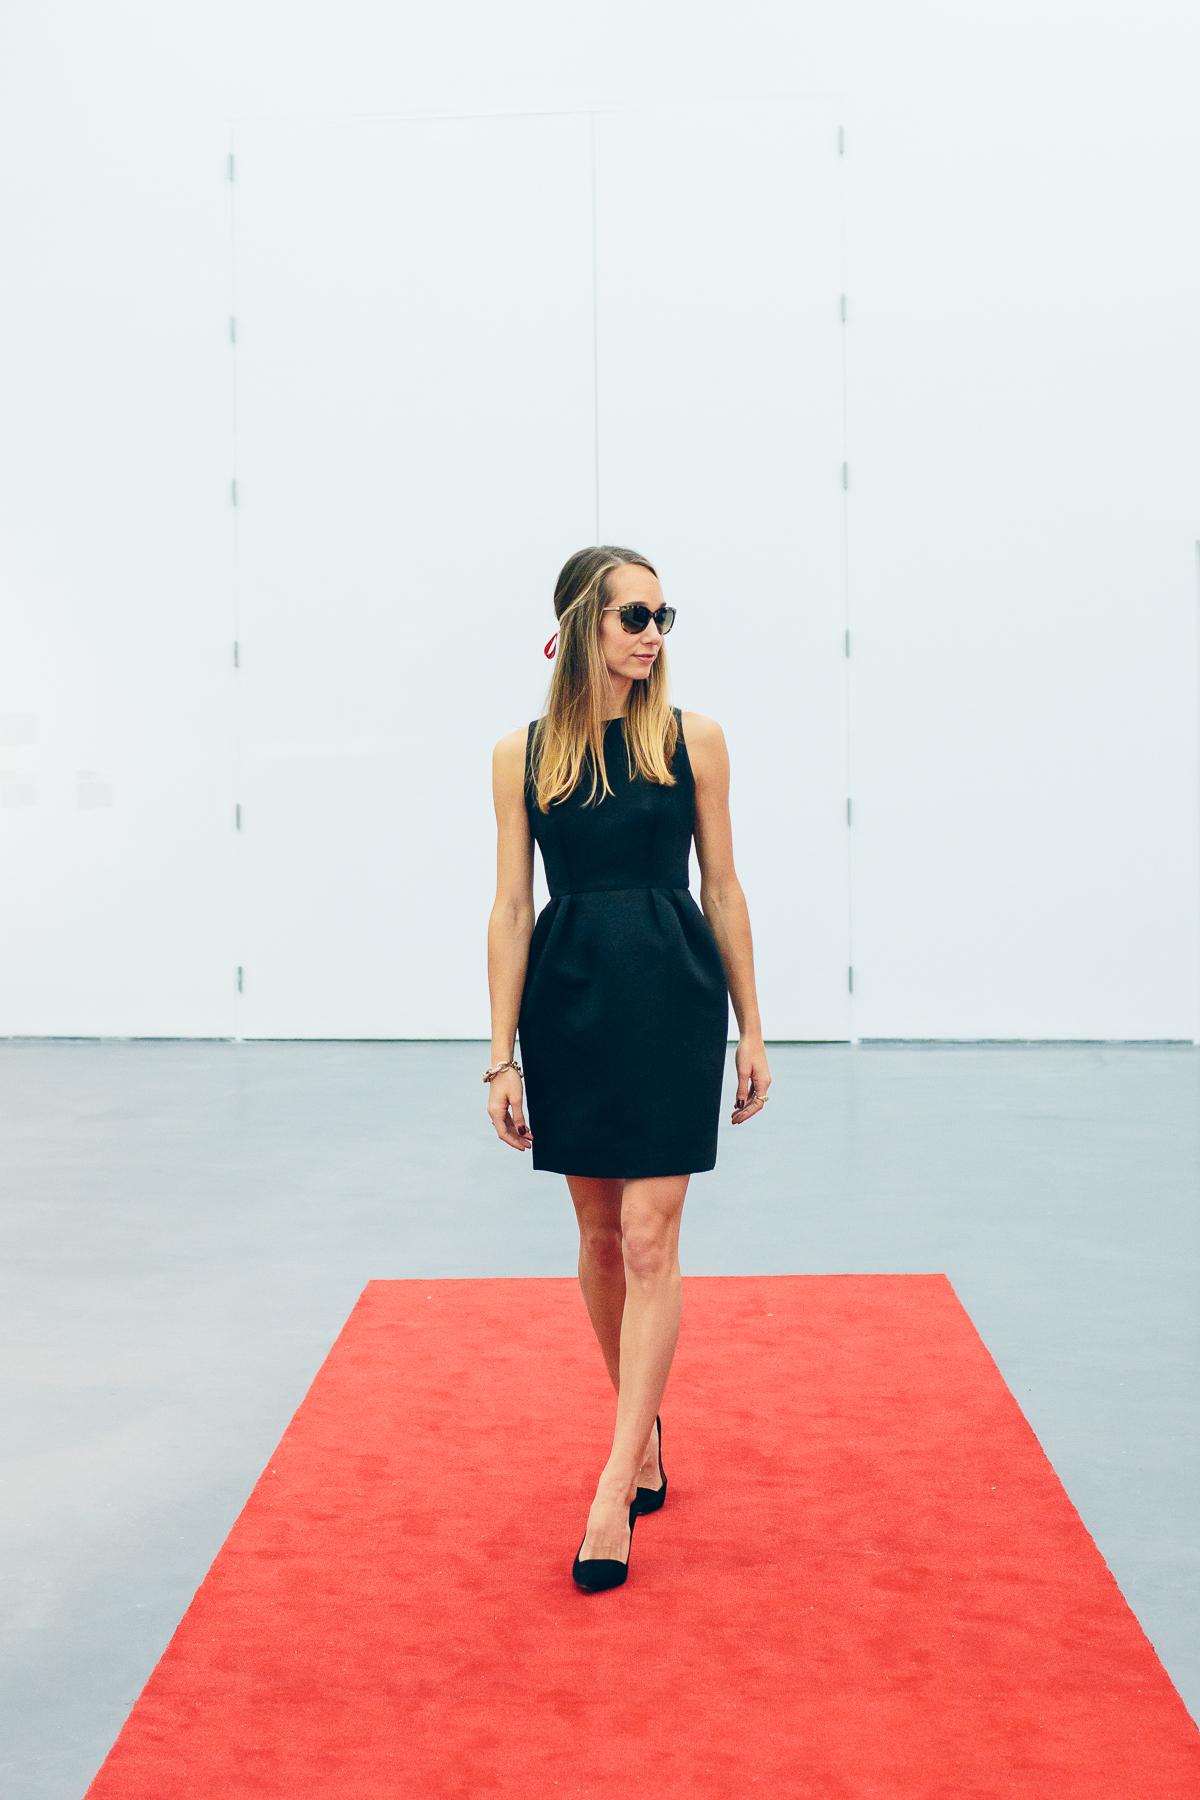 Kate Spade New York Sunglasses & Dress —via @TheFoxandShe